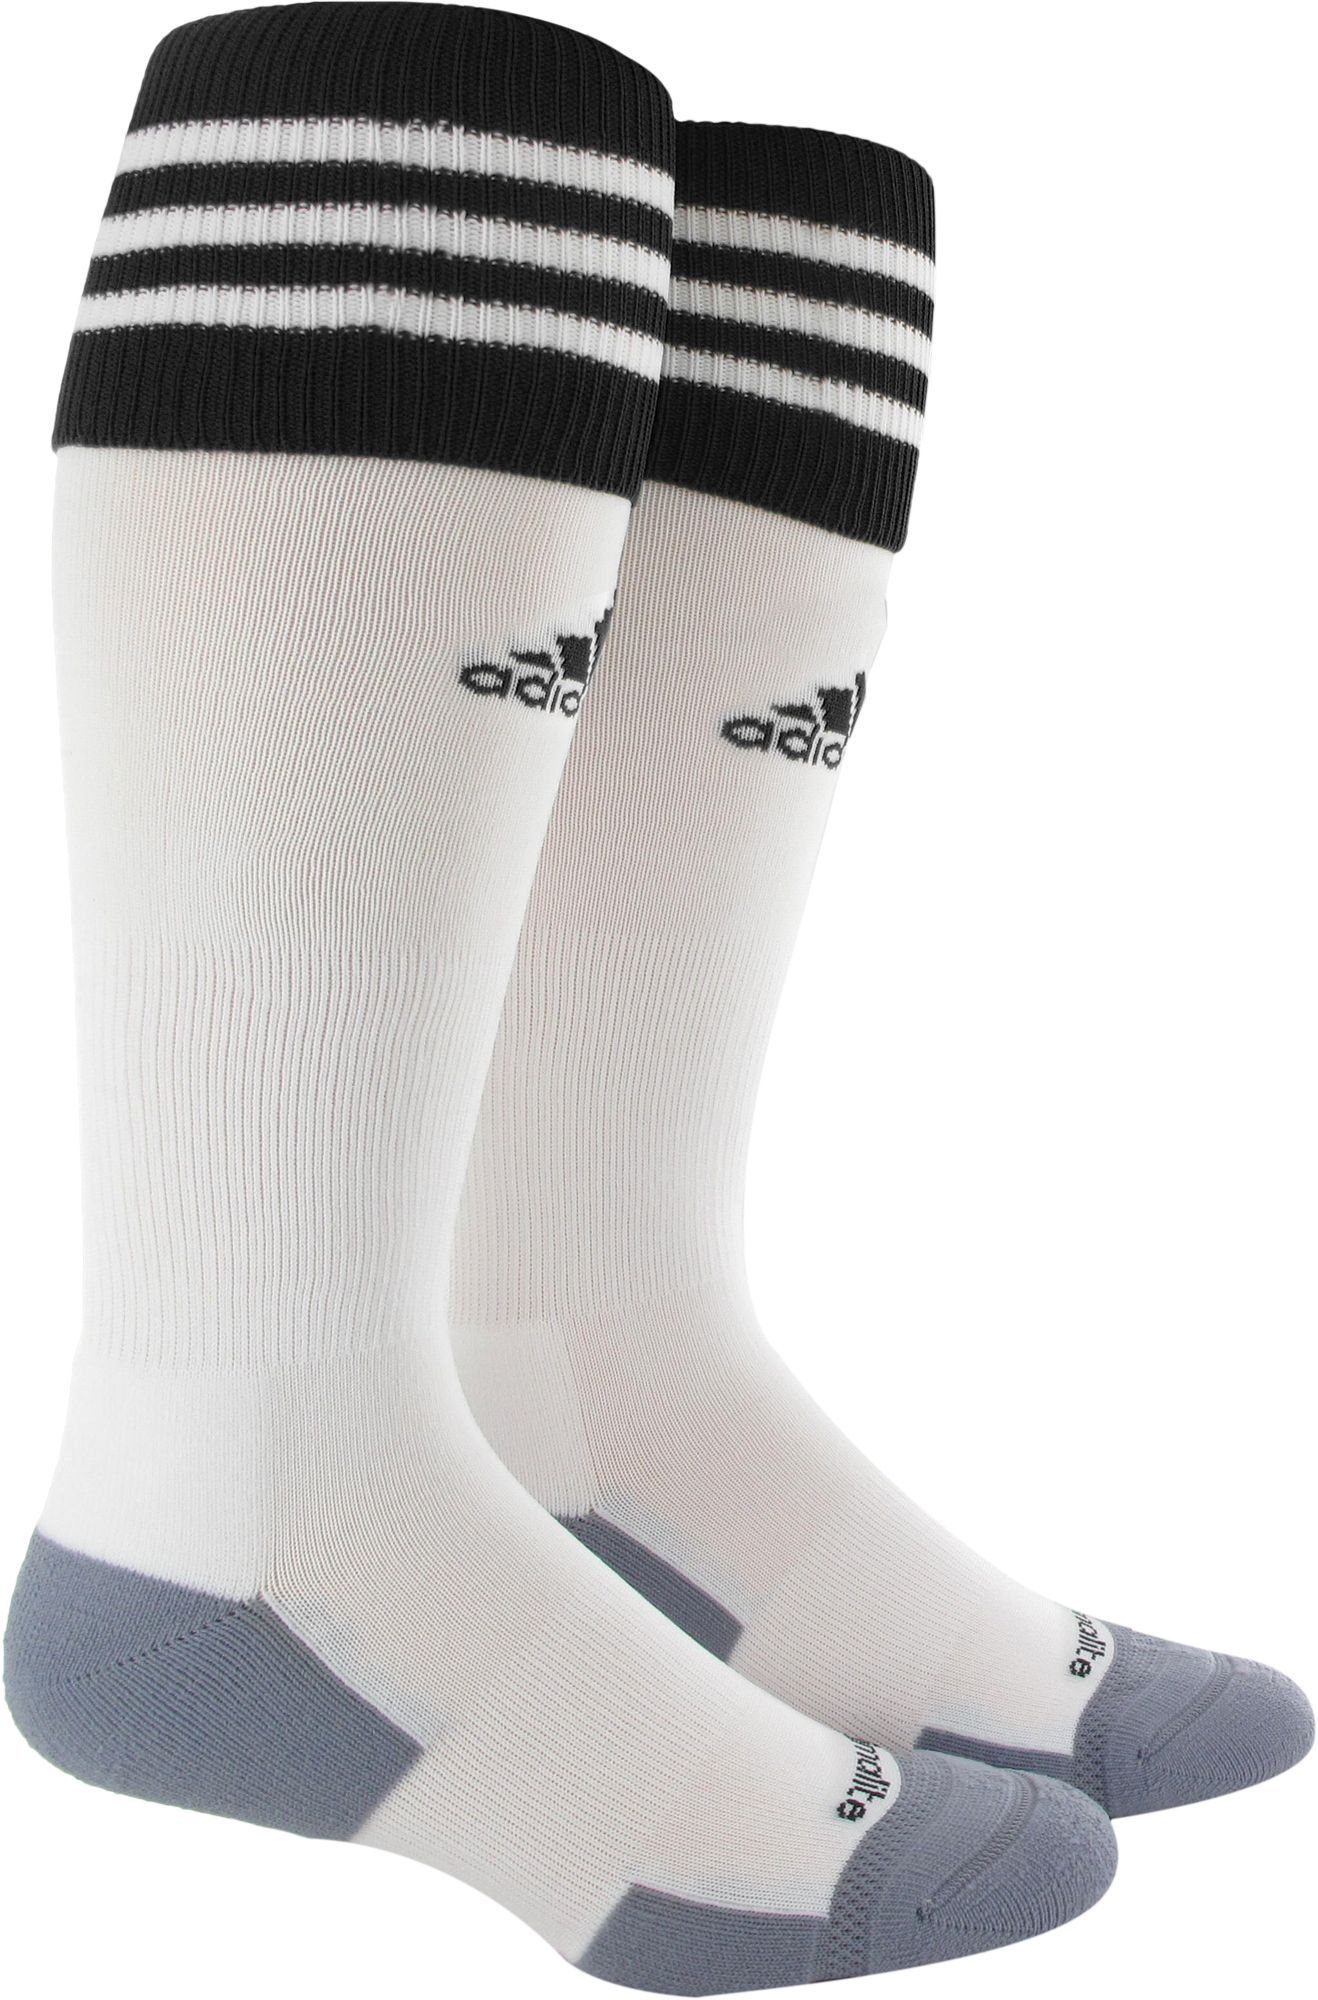 a500283aa adidas Copa Zone Cushion II Soccer Socks, Kids Unisex, Size: Medium, White